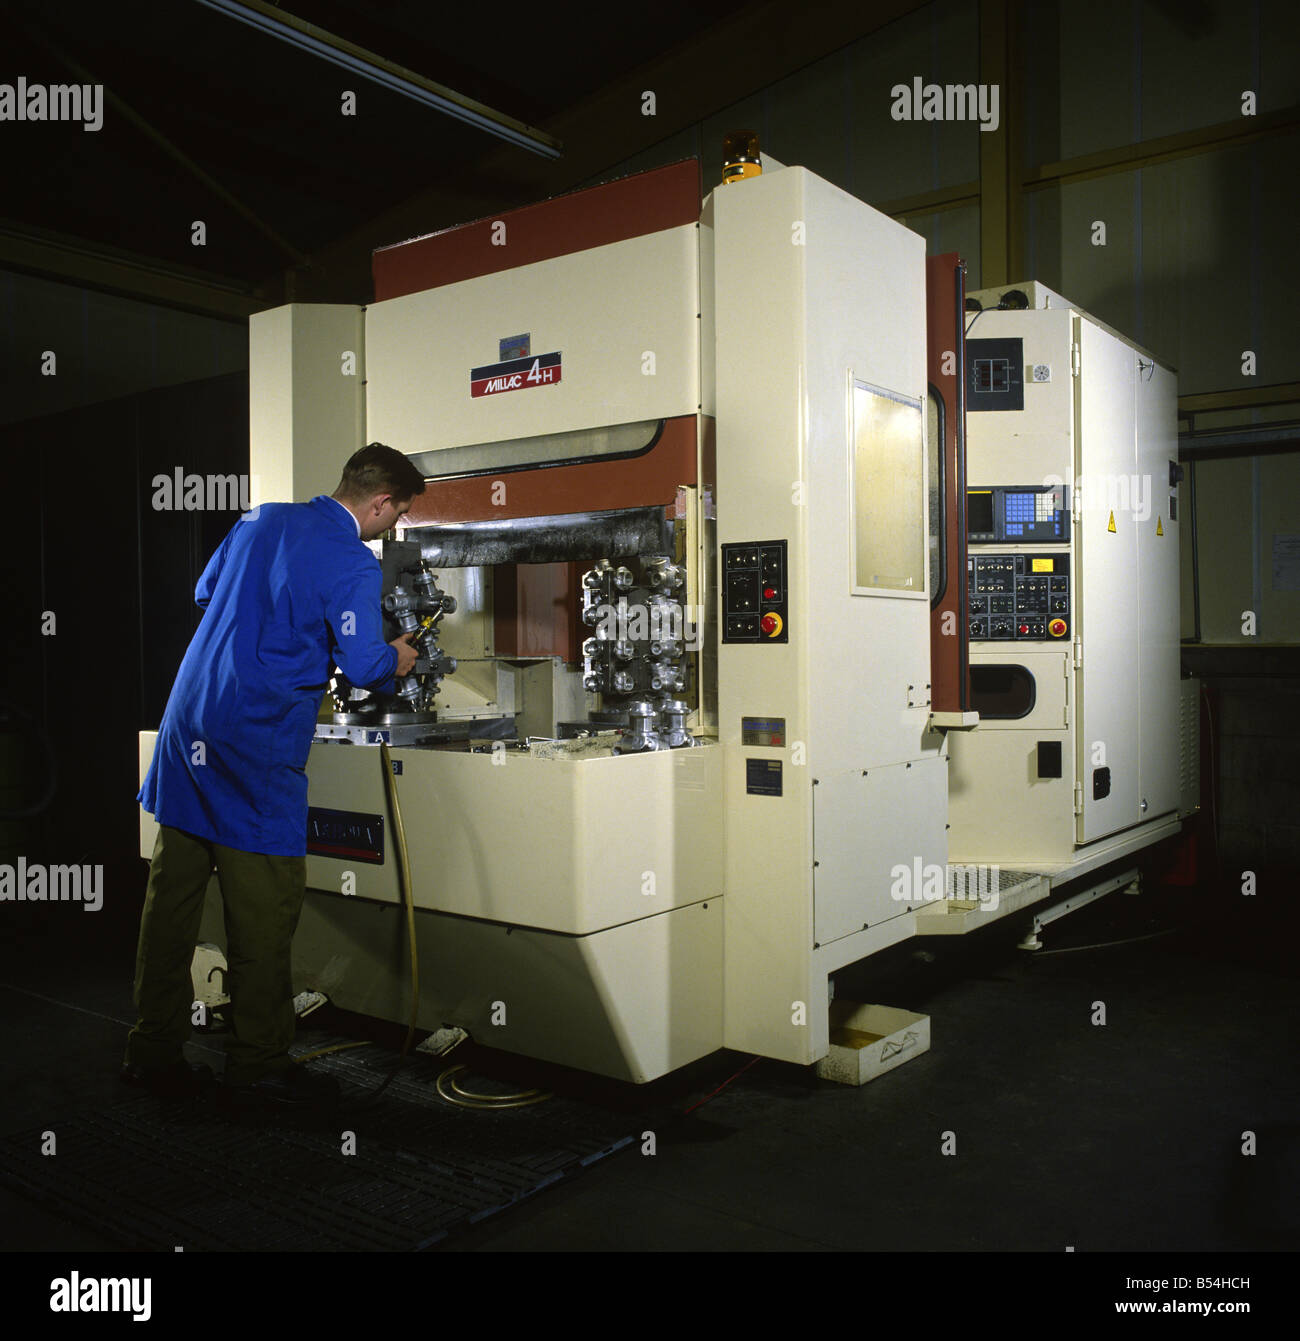 CNC Milling Machine - Stock Image